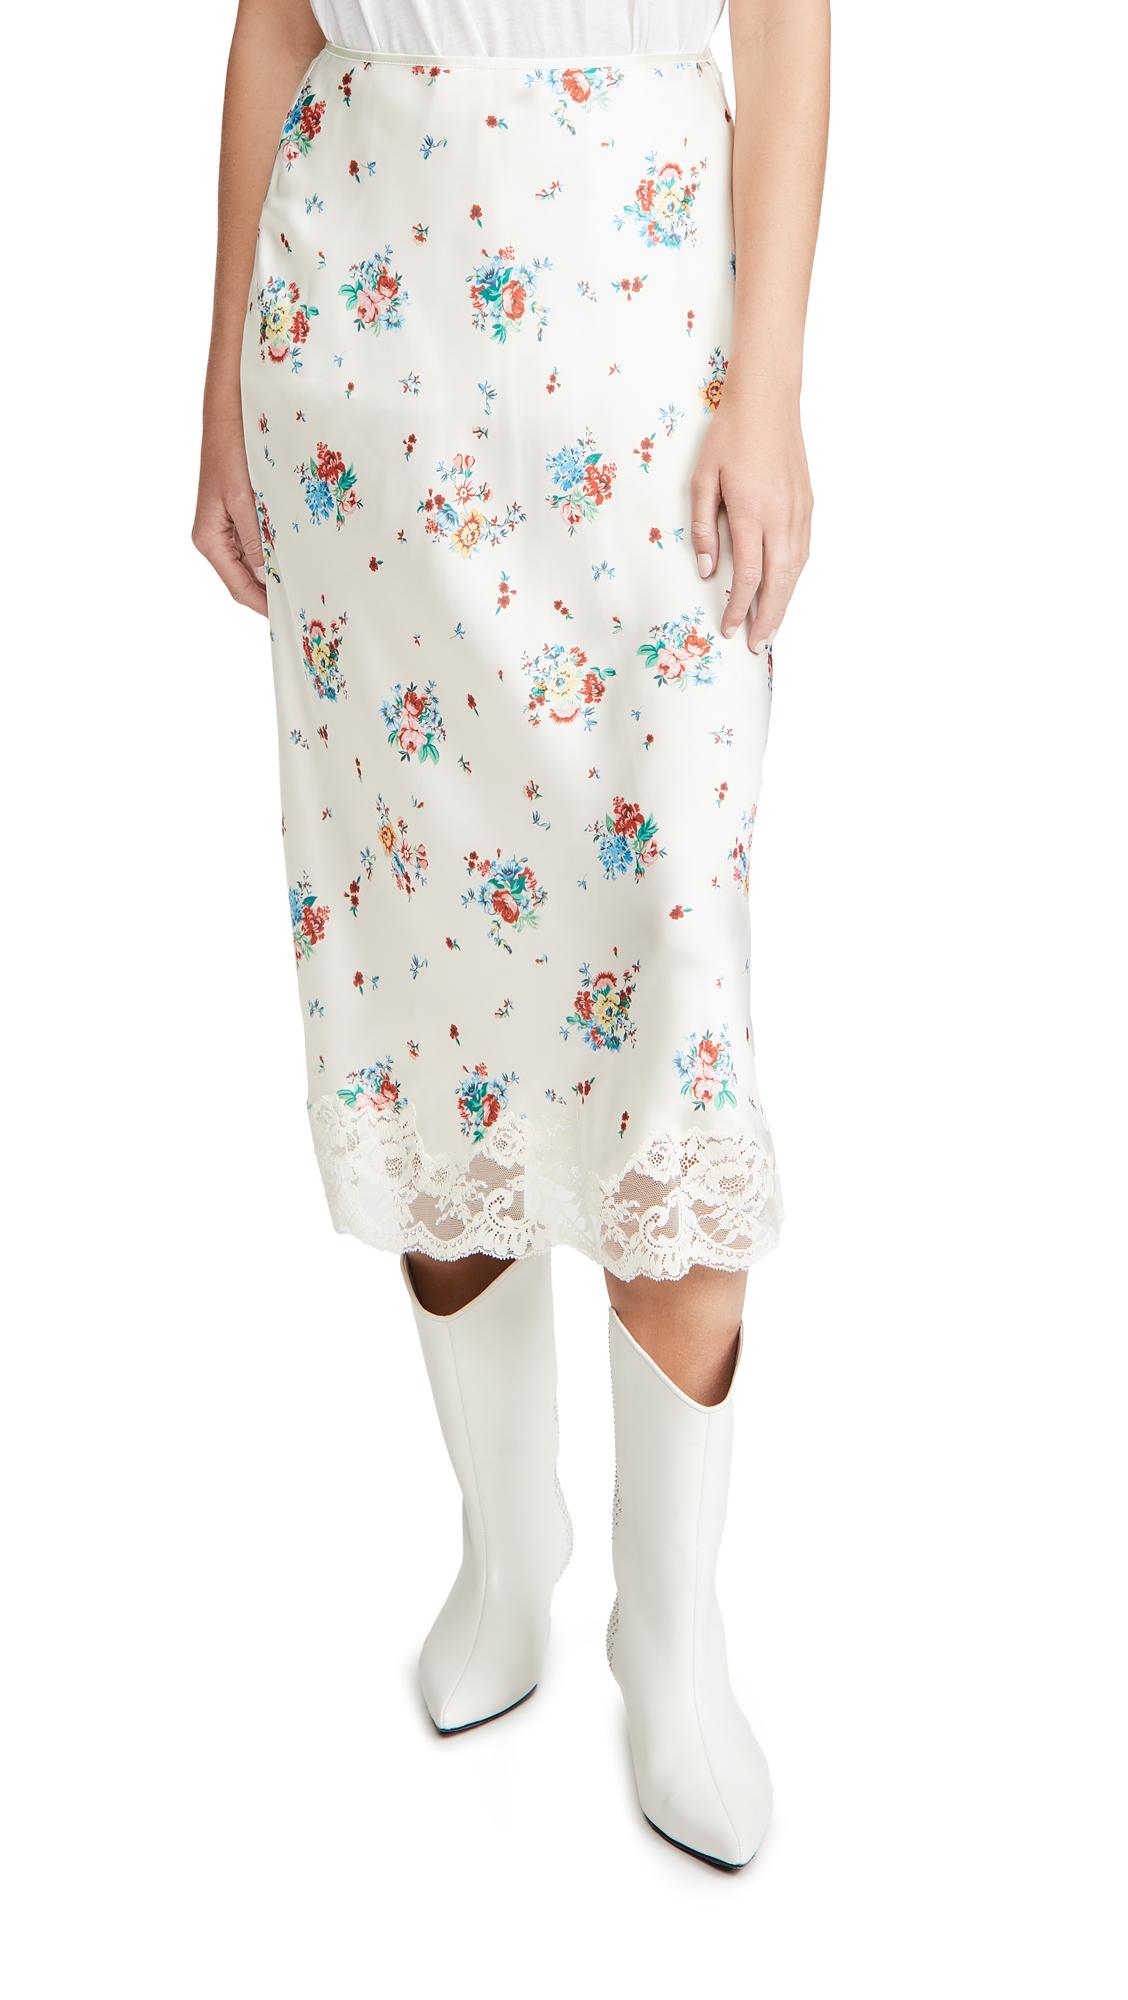 Paco Rabanne Floral Printed Skirt